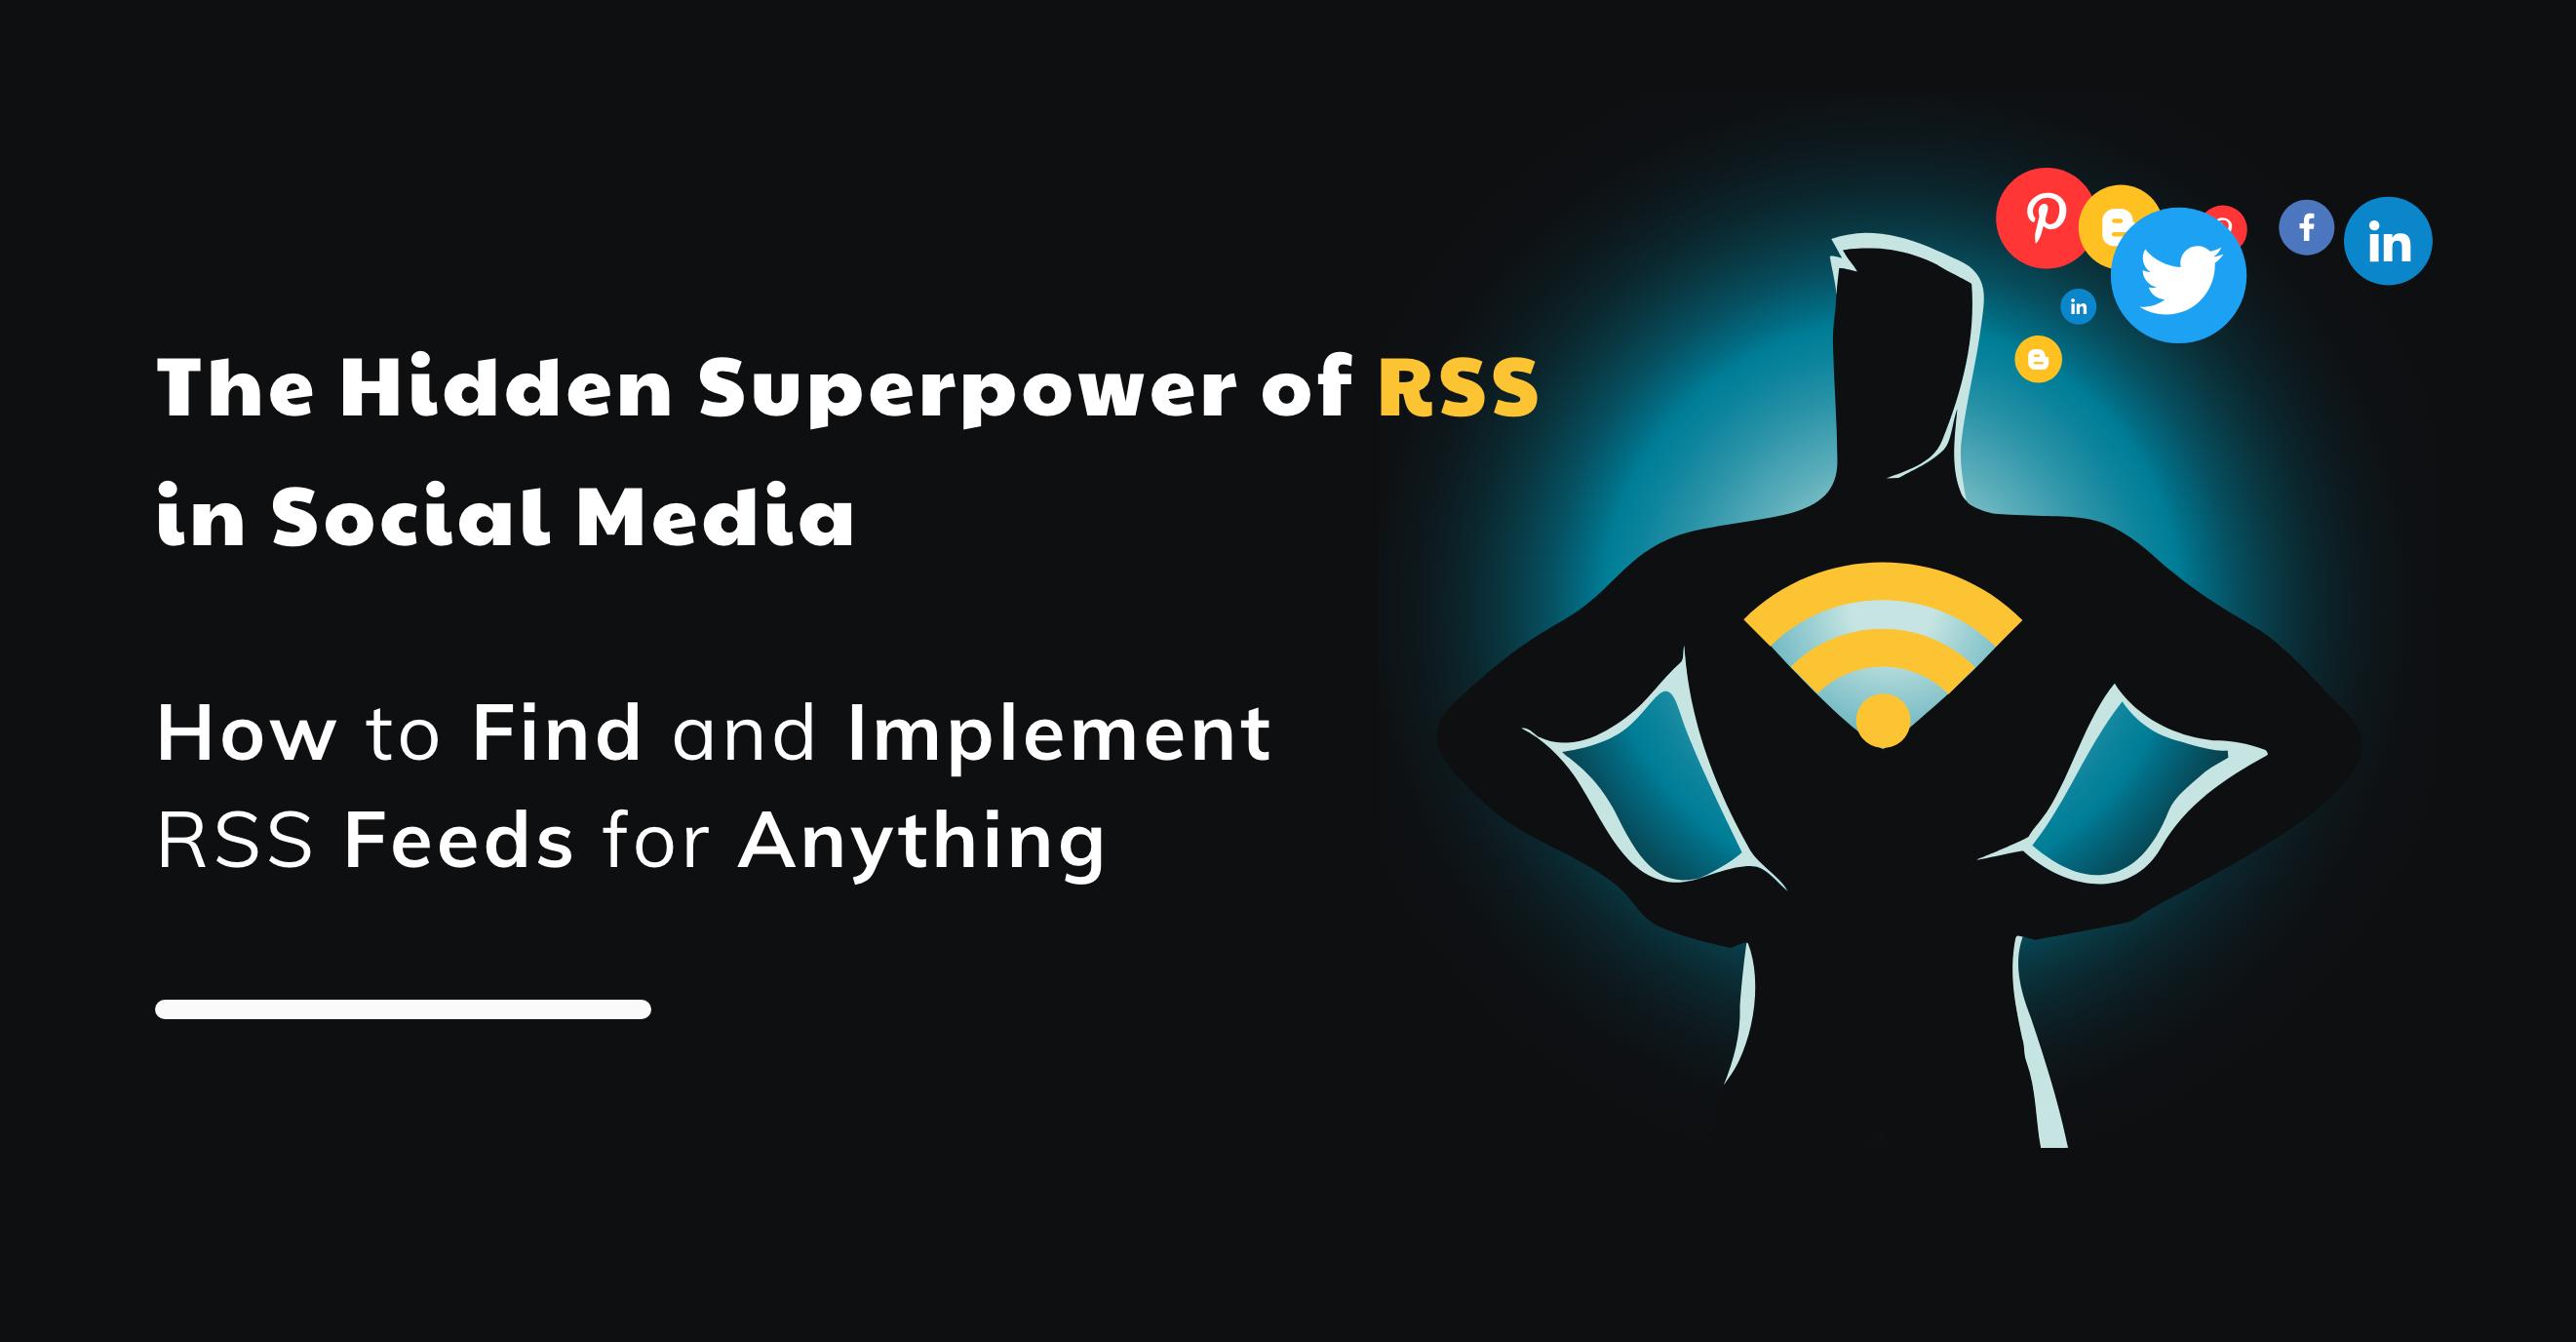 Superpower of RSS- ContentStudio